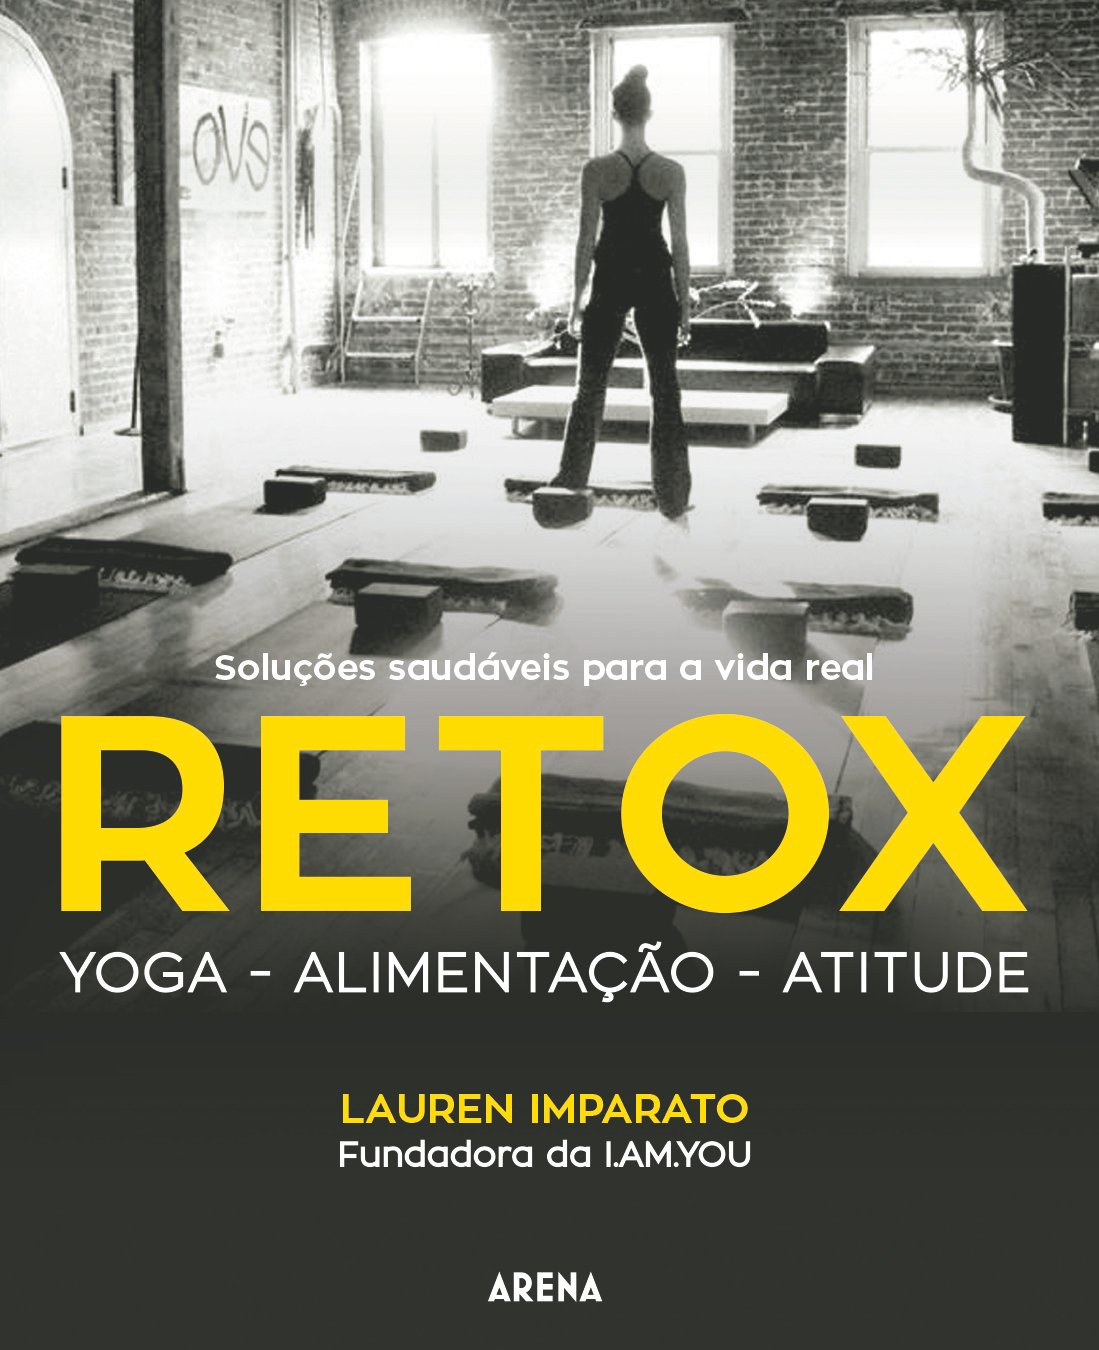 Retox Kfrente 150dpi